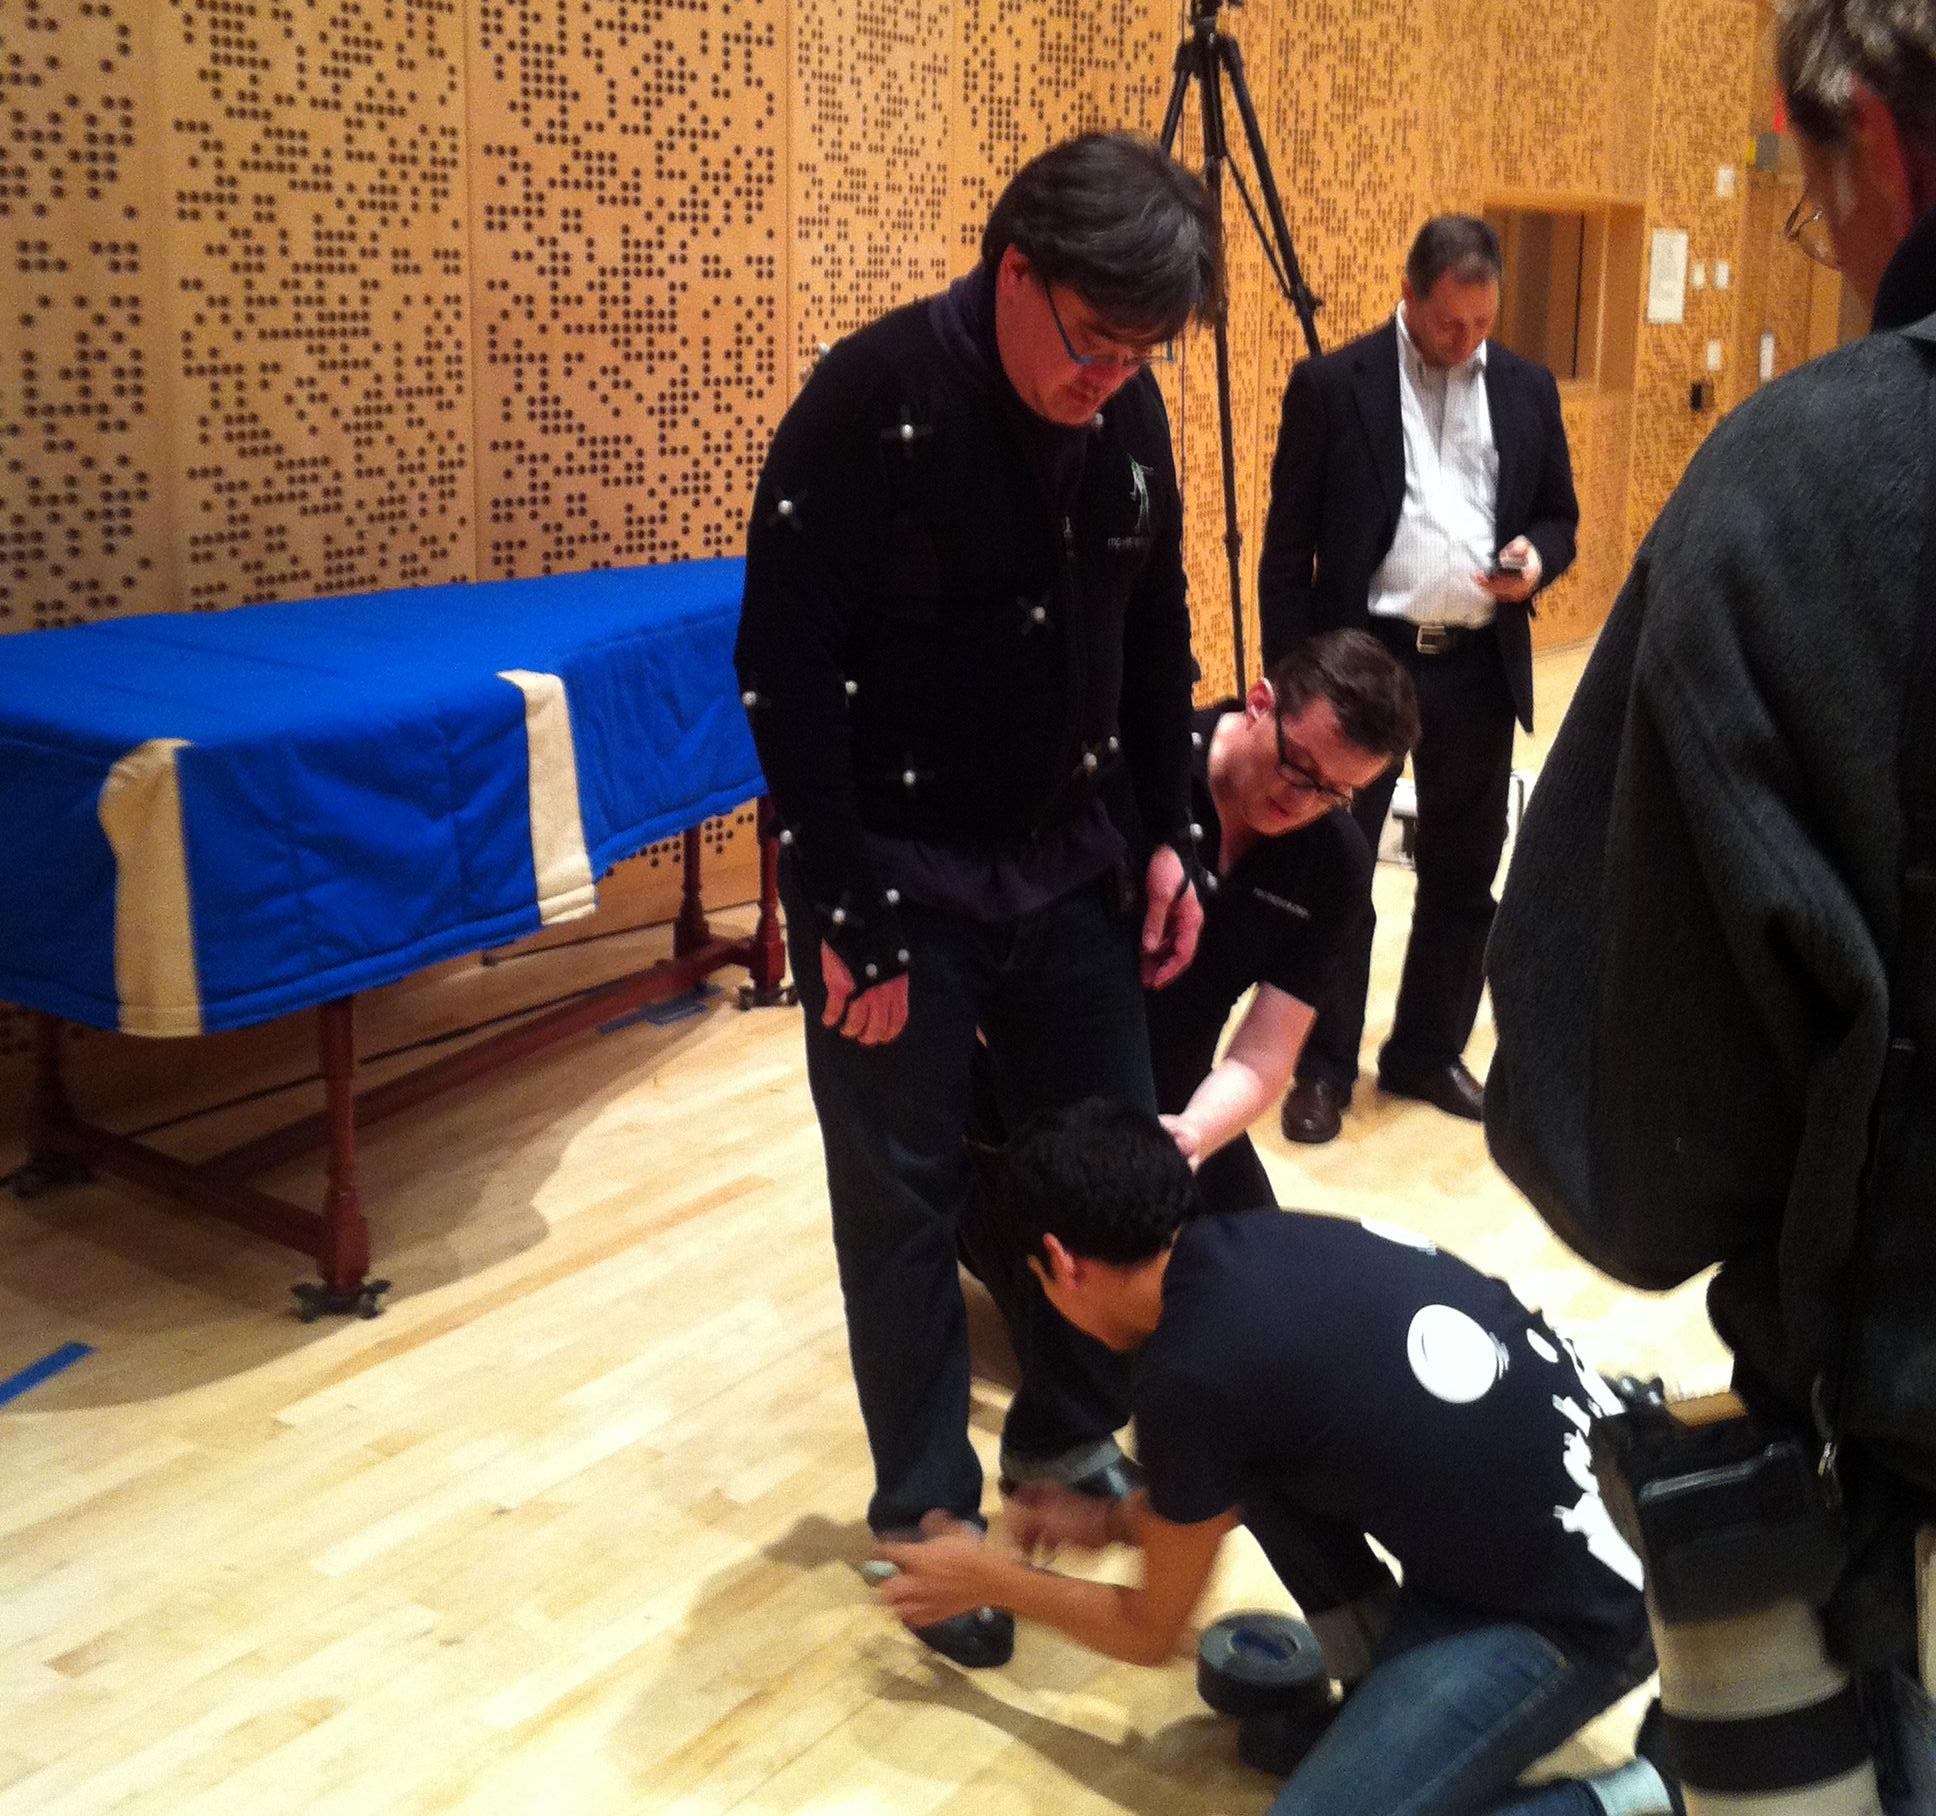 Motion Capture suit test in the studio.